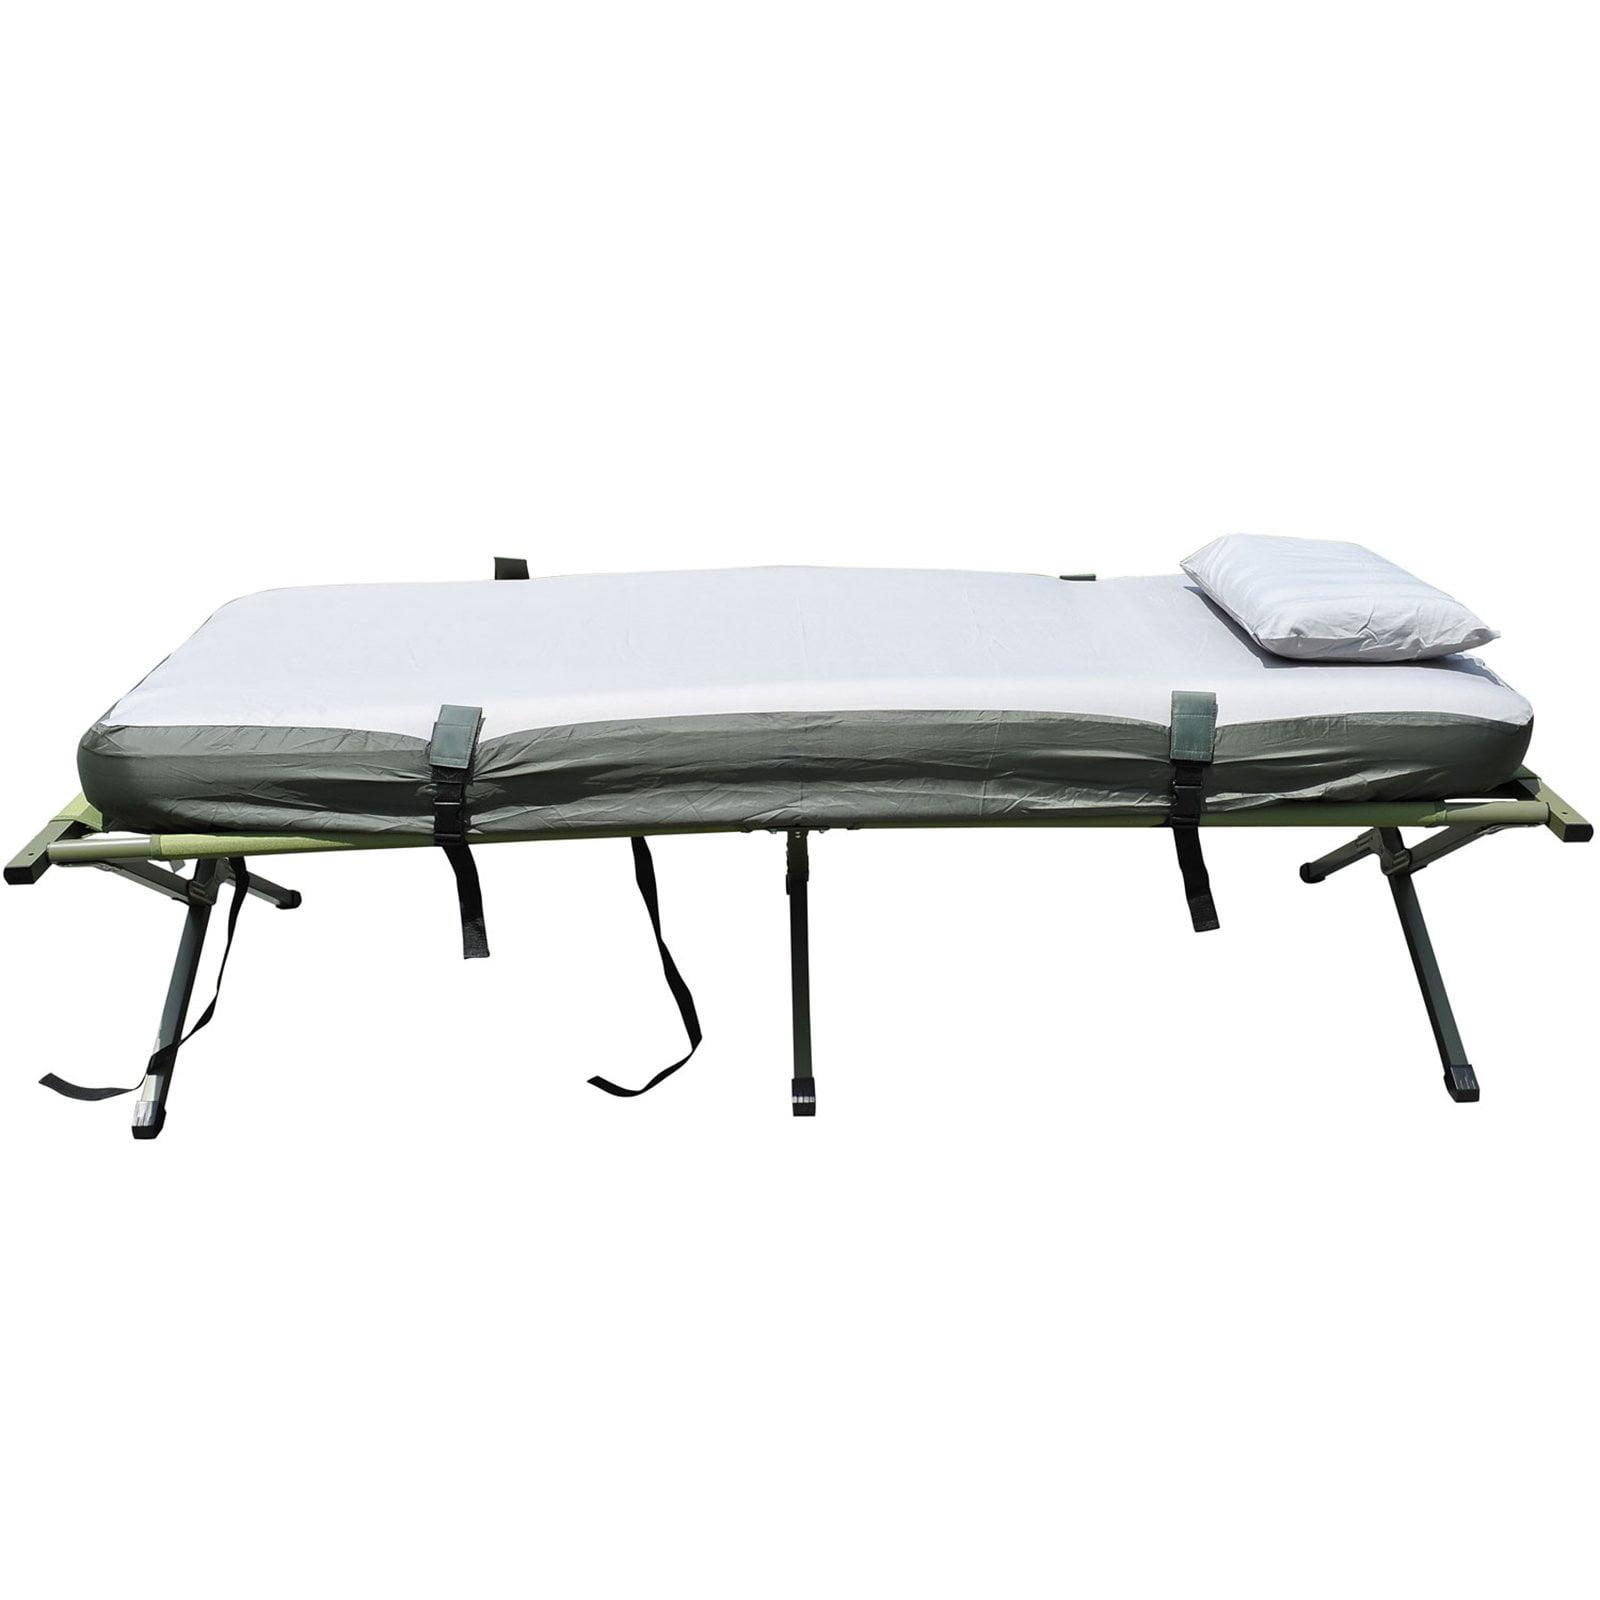 Outsunny Air Mattress Sleeping Bag Combo Pop Up Tent Cot Walmart Com